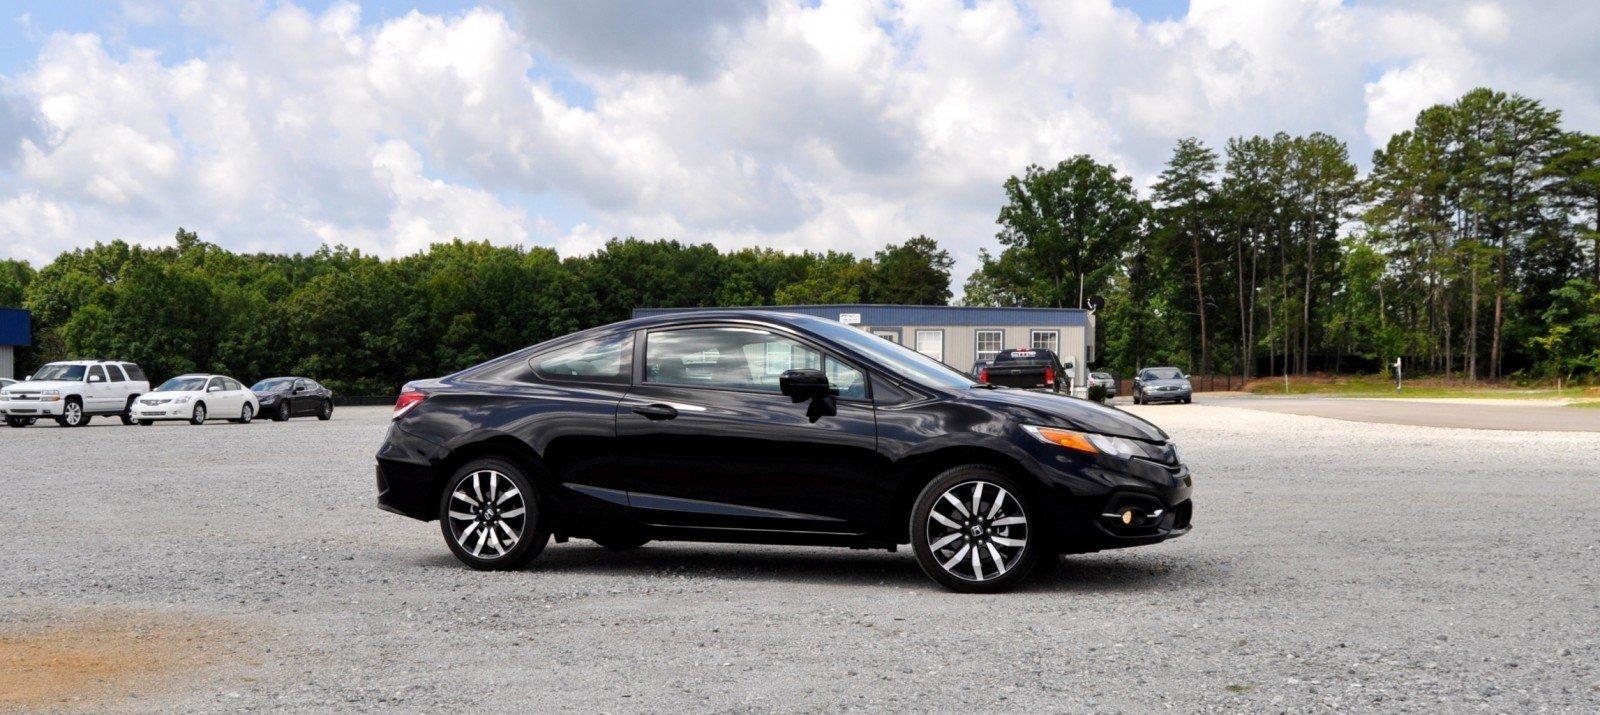 road test review 2014 honda civic ex l coupe 117 car. Black Bedroom Furniture Sets. Home Design Ideas